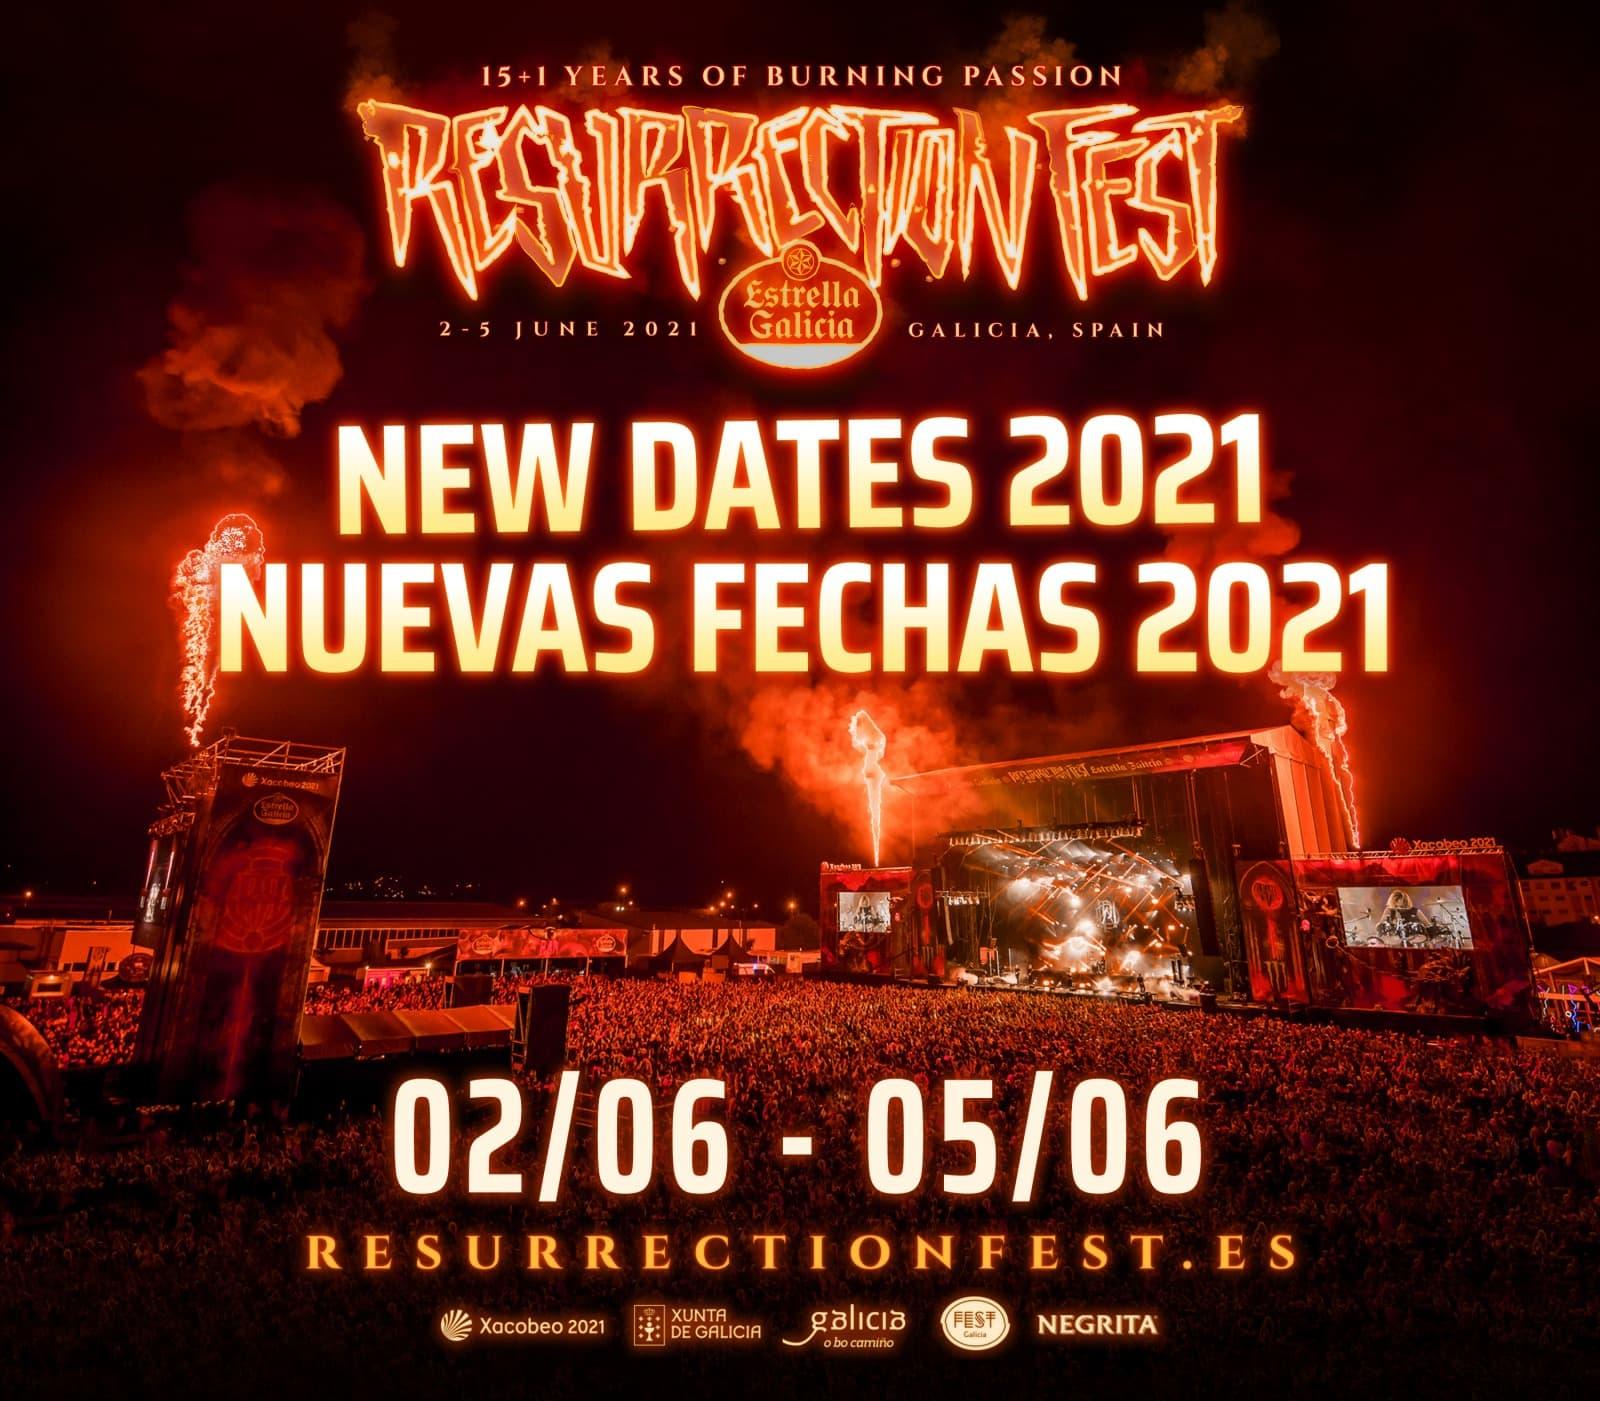 nuevas fechas Resurrection Fest 2021